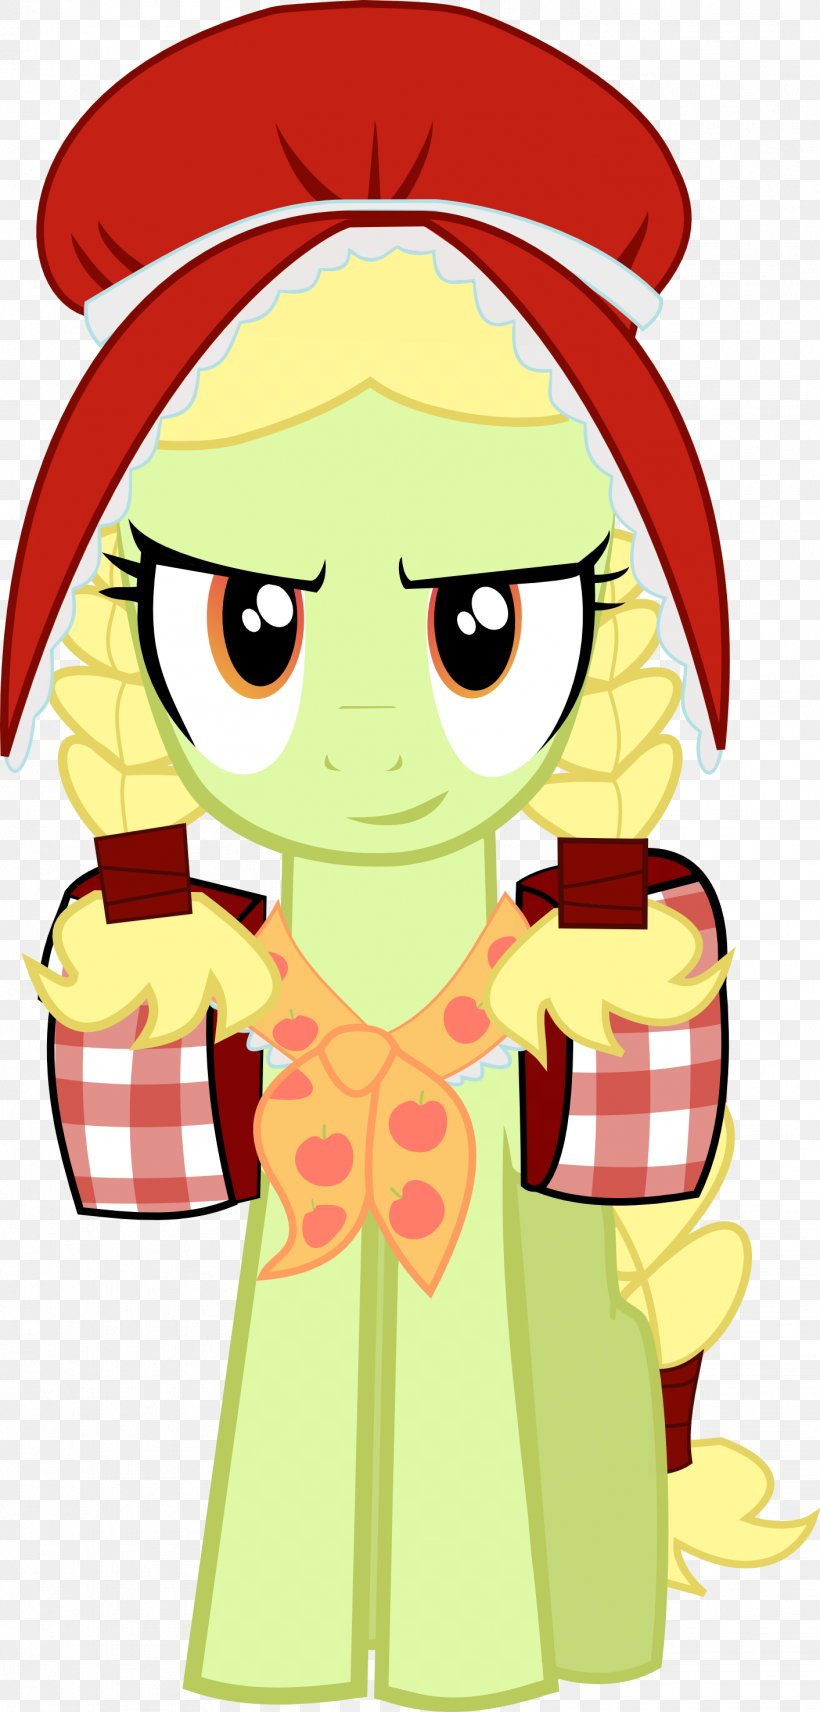 Pony Horse Applejack Derpy Hooves Big McIntosh, PNG, 1412x2948px, Watercolor, Cartoon, Flower, Frame, Heart Download Free